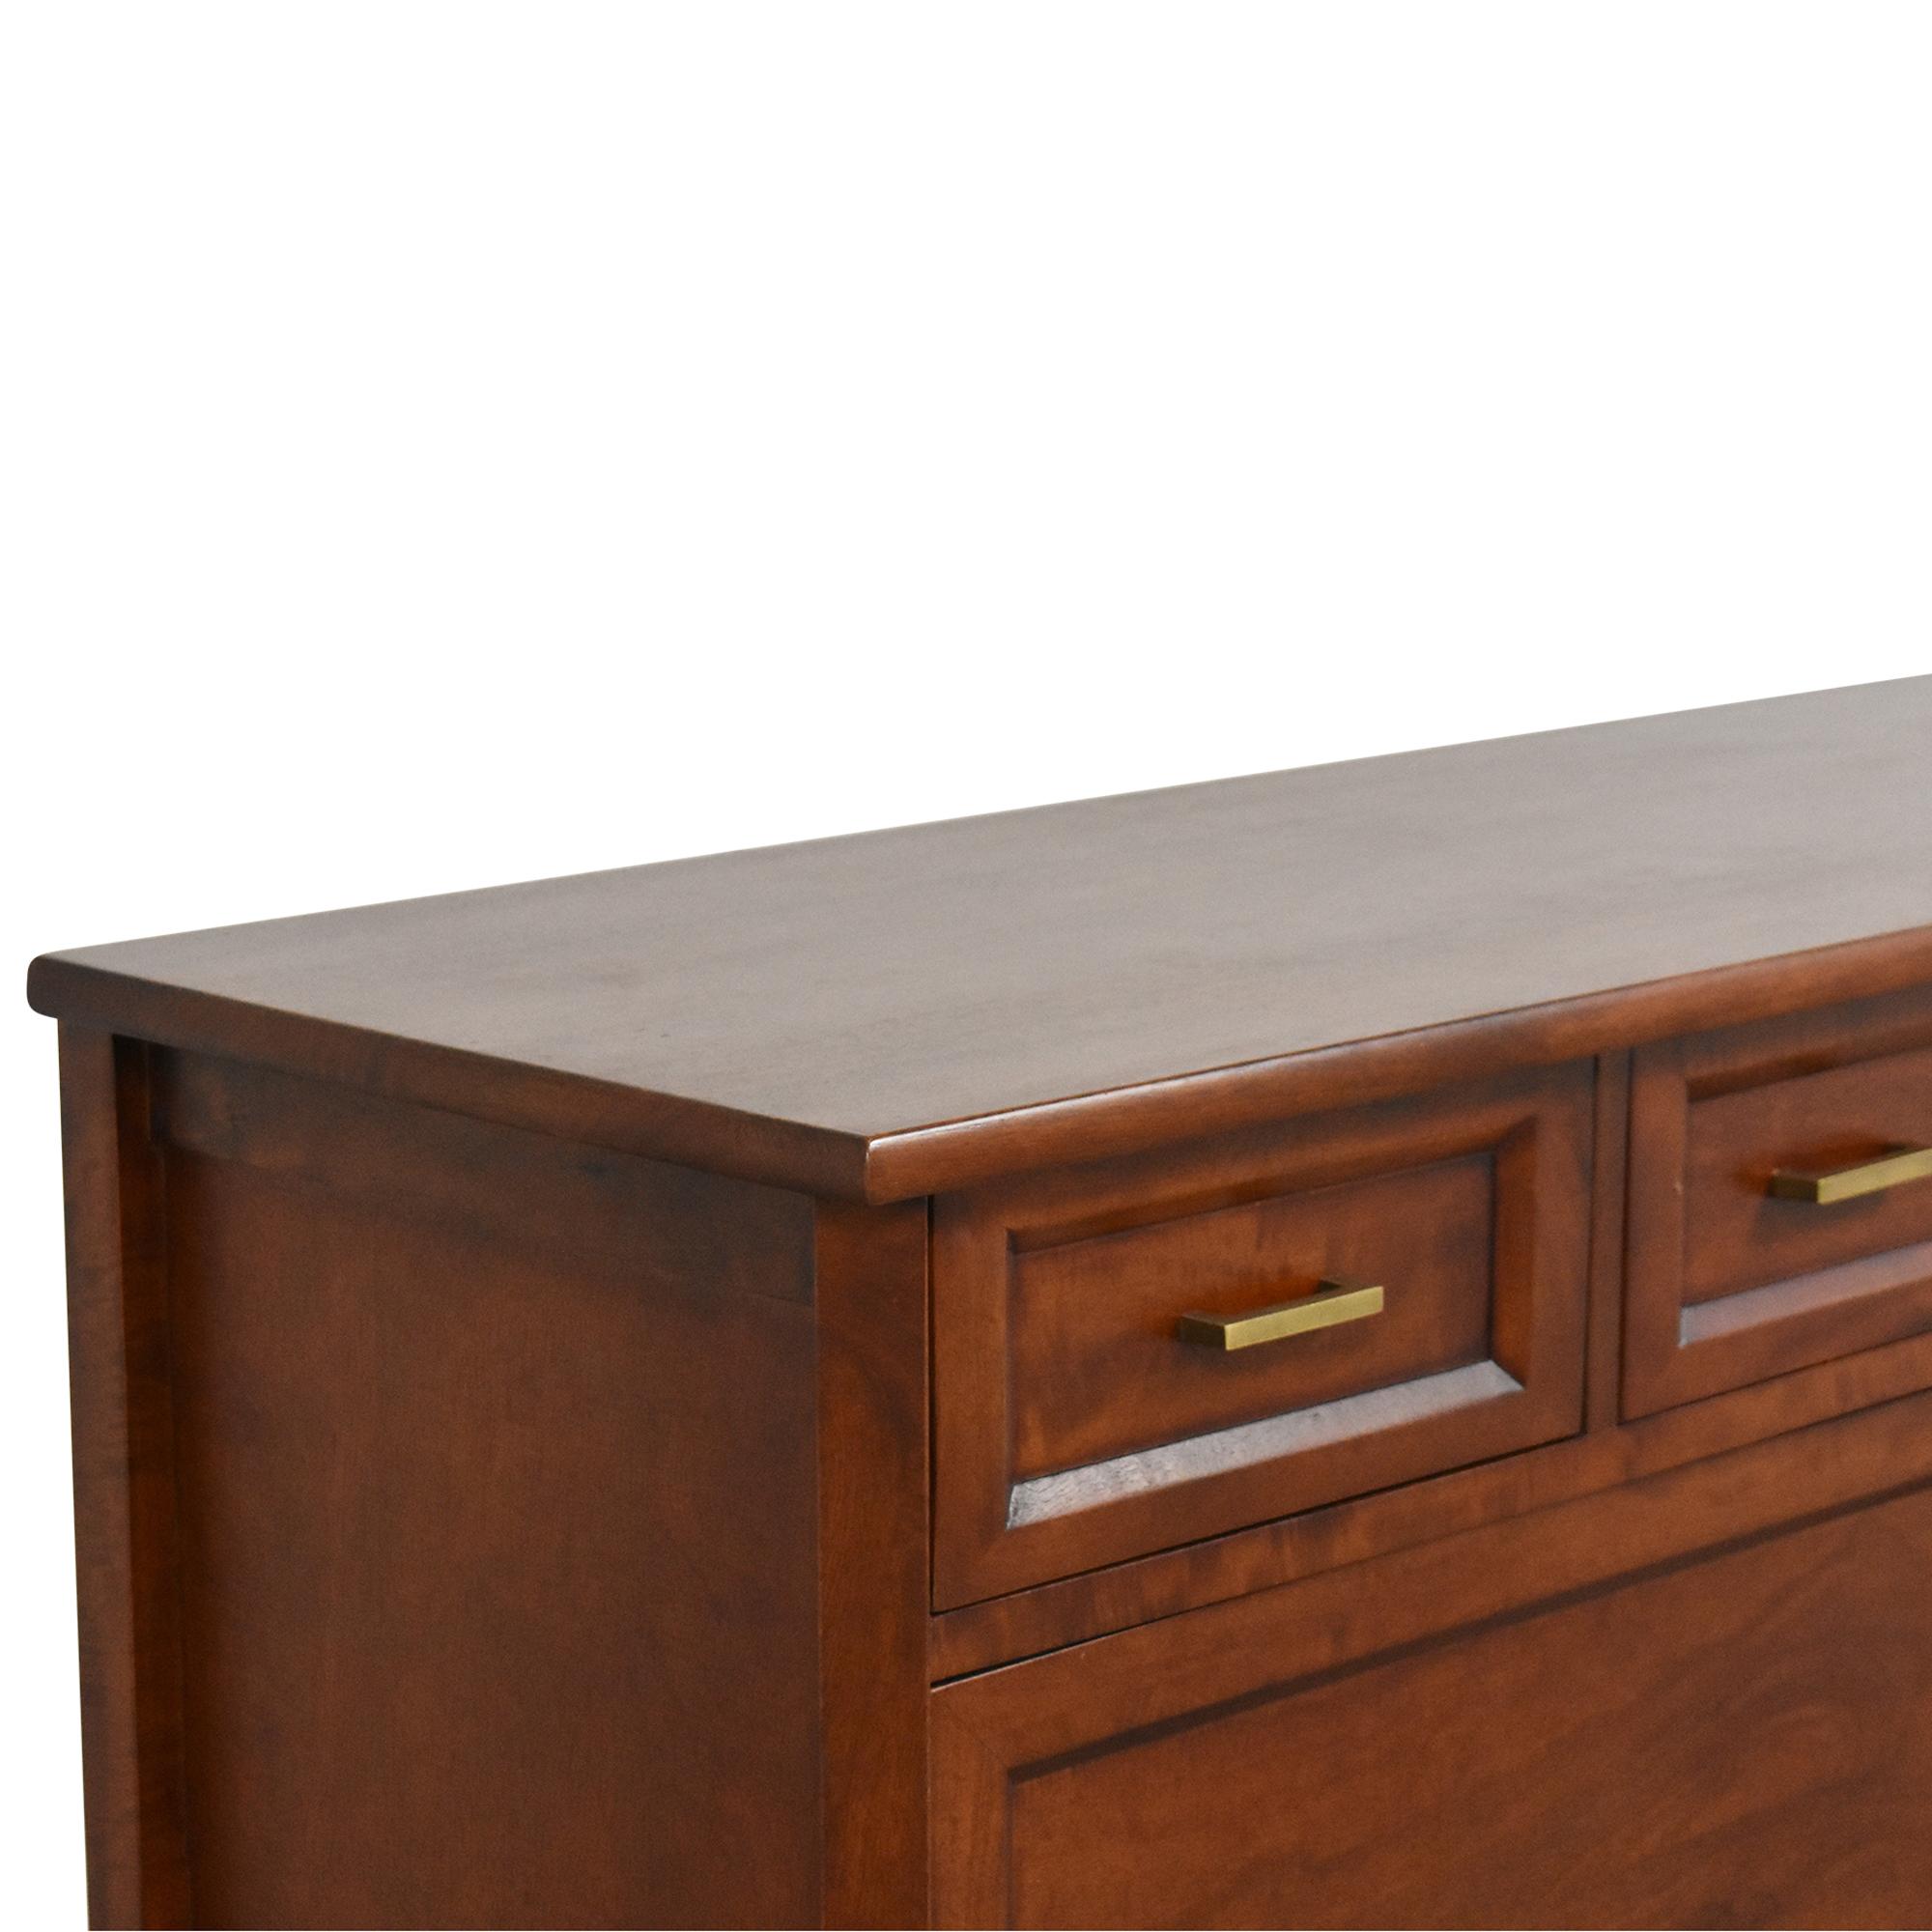 Crate & Barrel Sliding Door Console / Storage